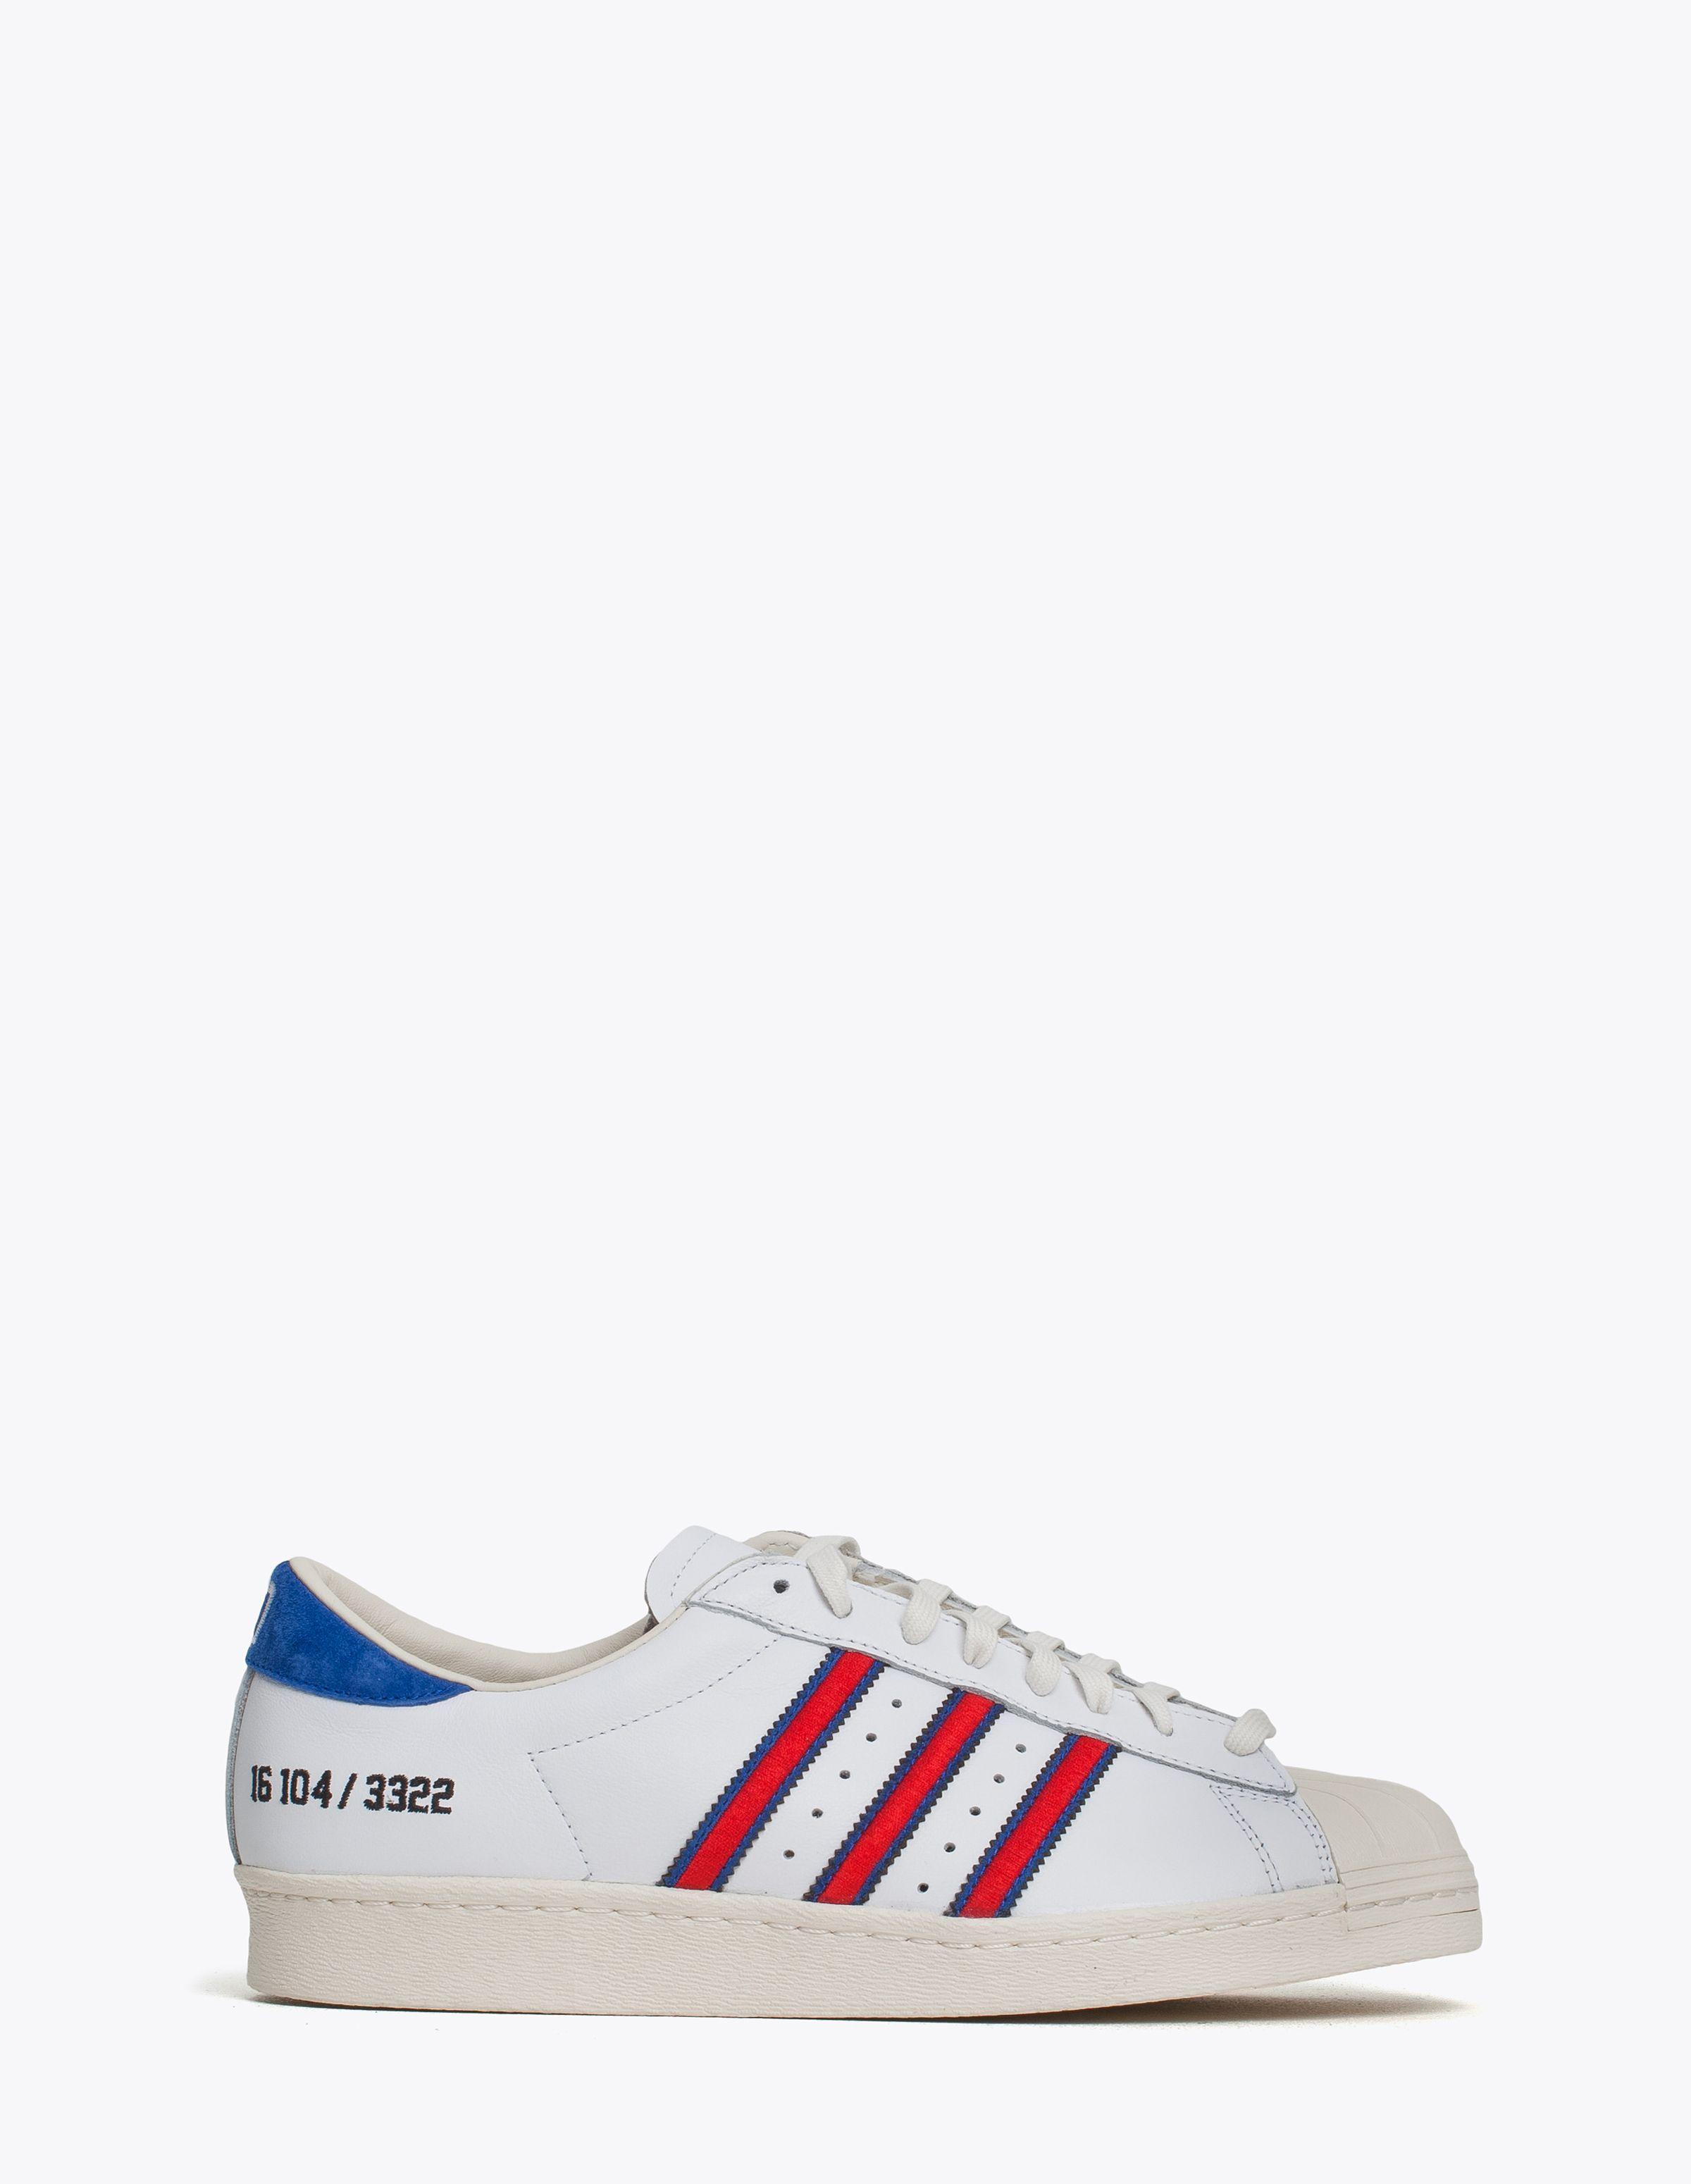 Adidas Originals - Superstar 80V D-Mop White   TRÈS BIEN   what the ... 95a26fea191f